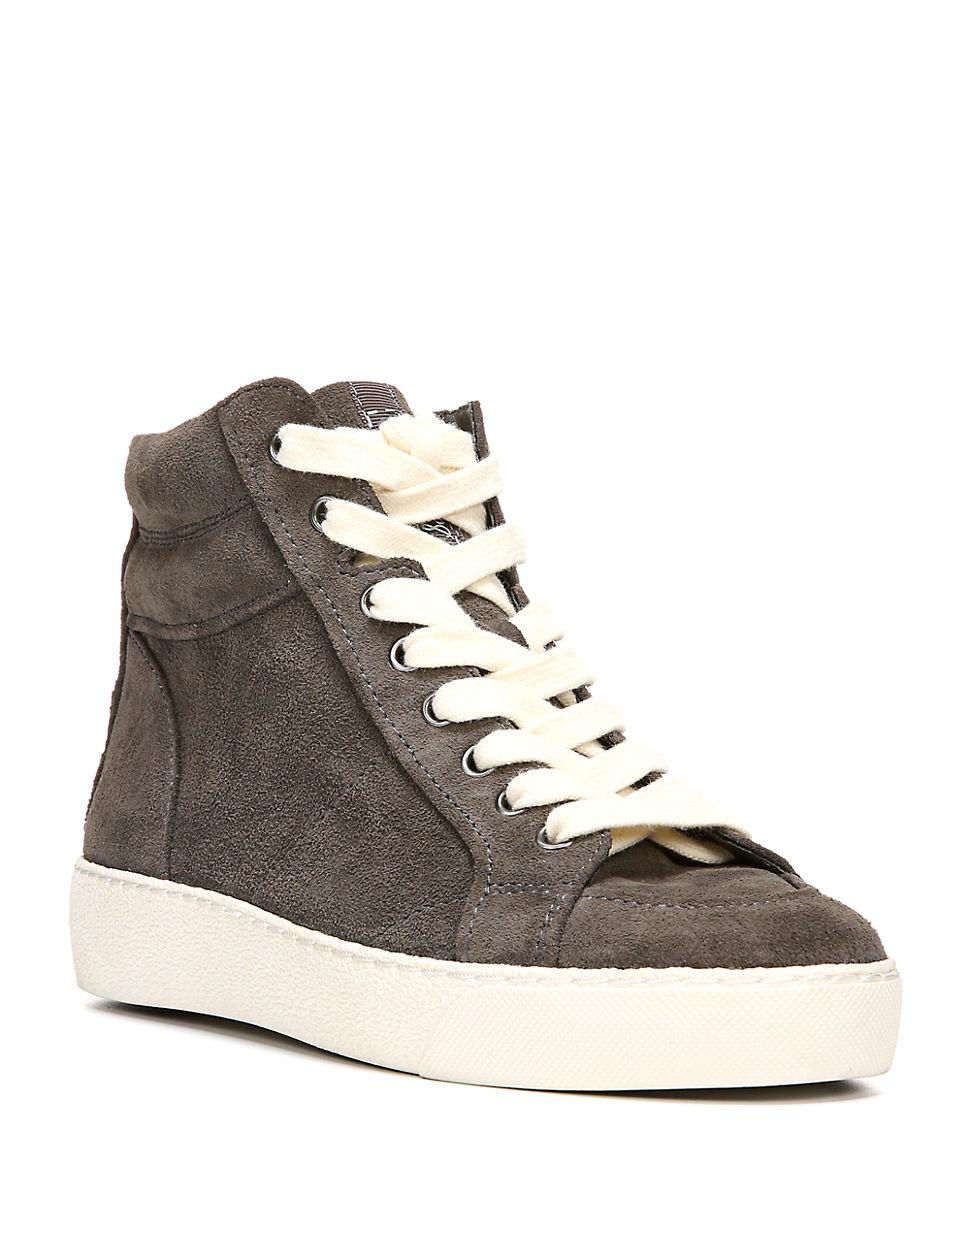 41f5723309a9 Lyst - Sam Edelman Britt Suede Hi-top Sneakers in Gray